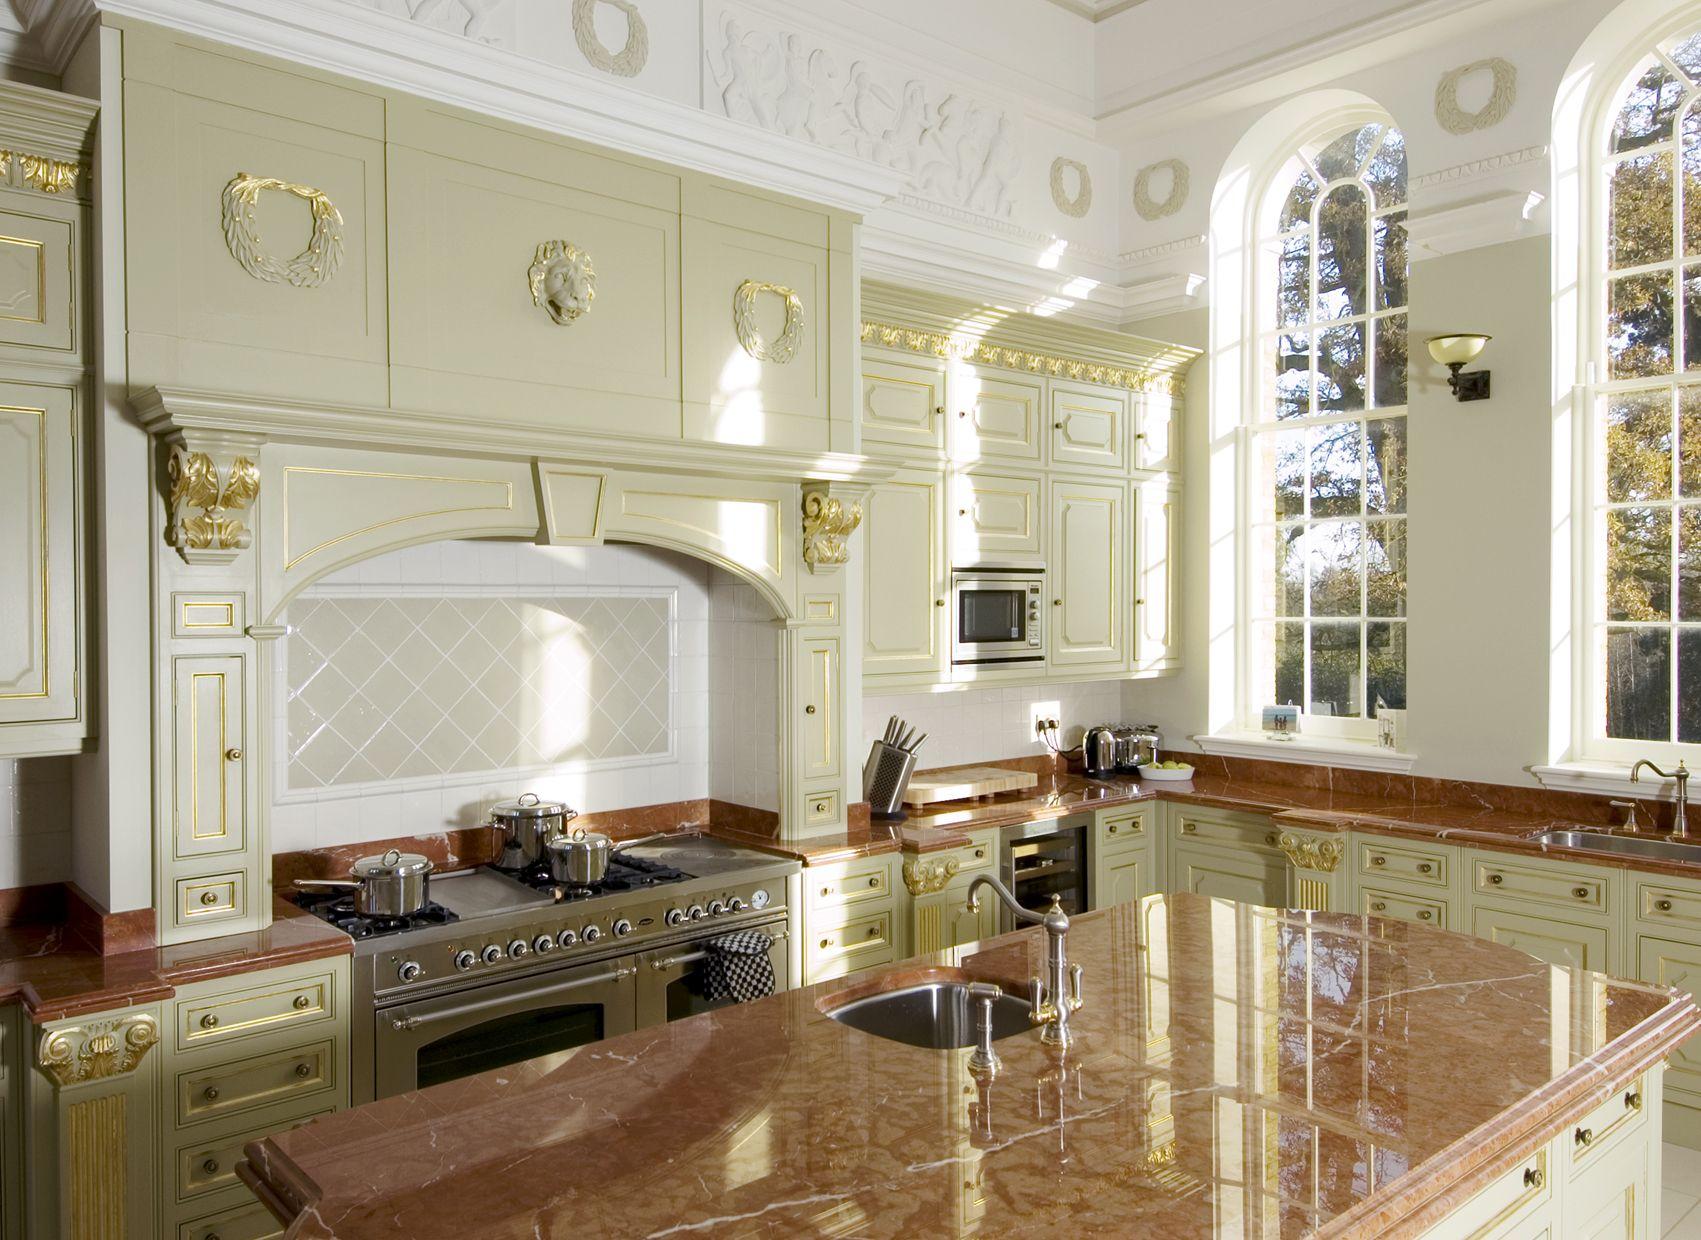 Best Kitchen Gallery: Clive Christian Kitchen Designed By Quinton Design Ltd Luxury of Clive Christian Kitchens on rachelxblog.com